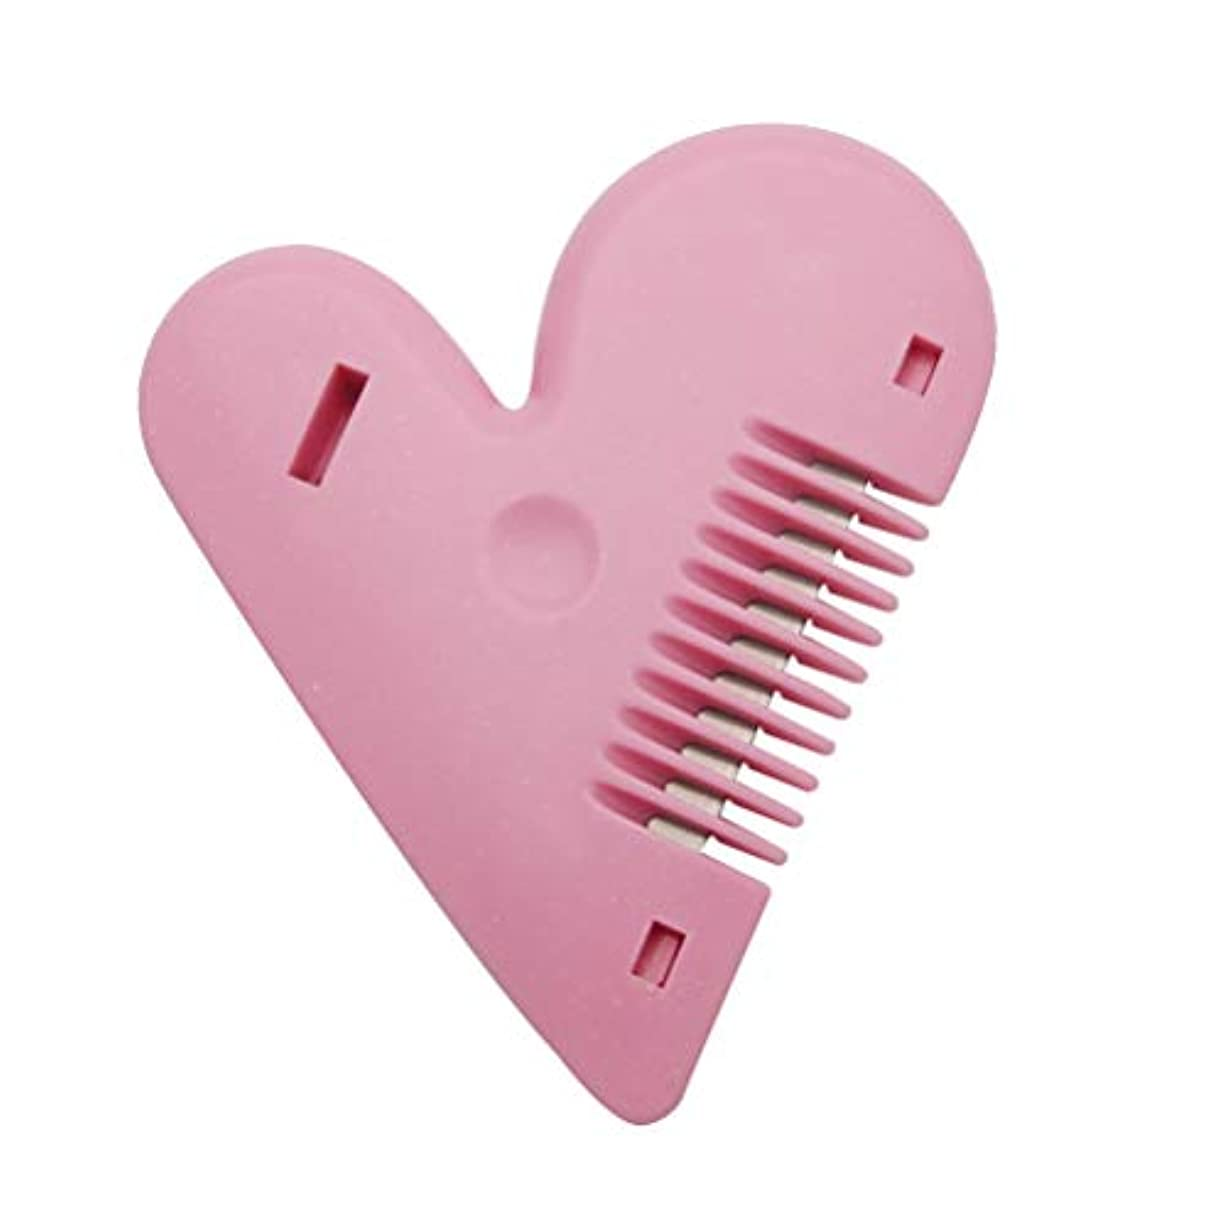 Lurrose 両面間伐櫛ハート型ヘアカットハサミプラスチックトリマーカミソリ髪用(ピンク)